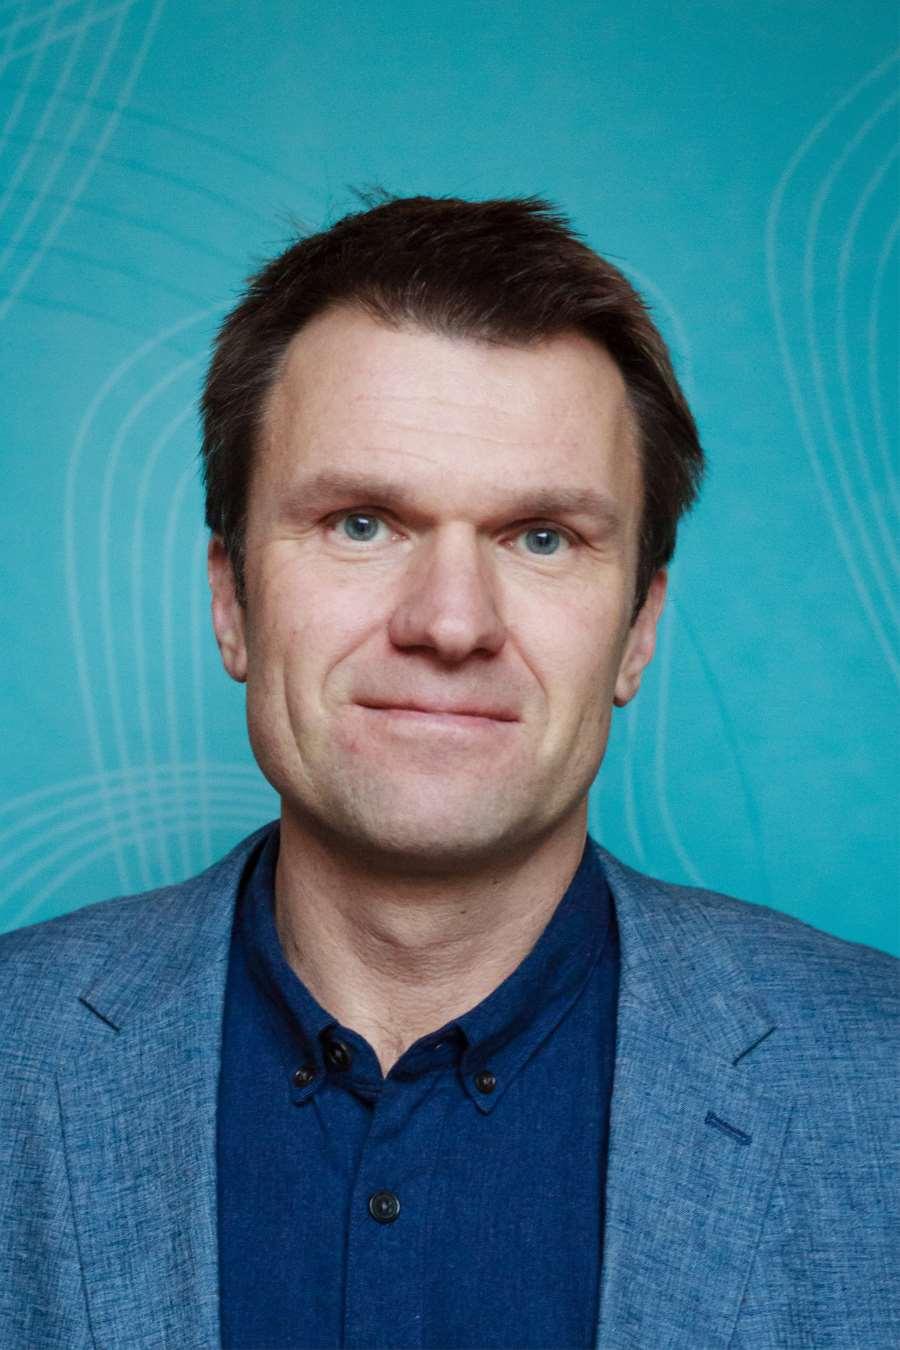 Torkel Brekke will be the new Deputy Director at PRIO